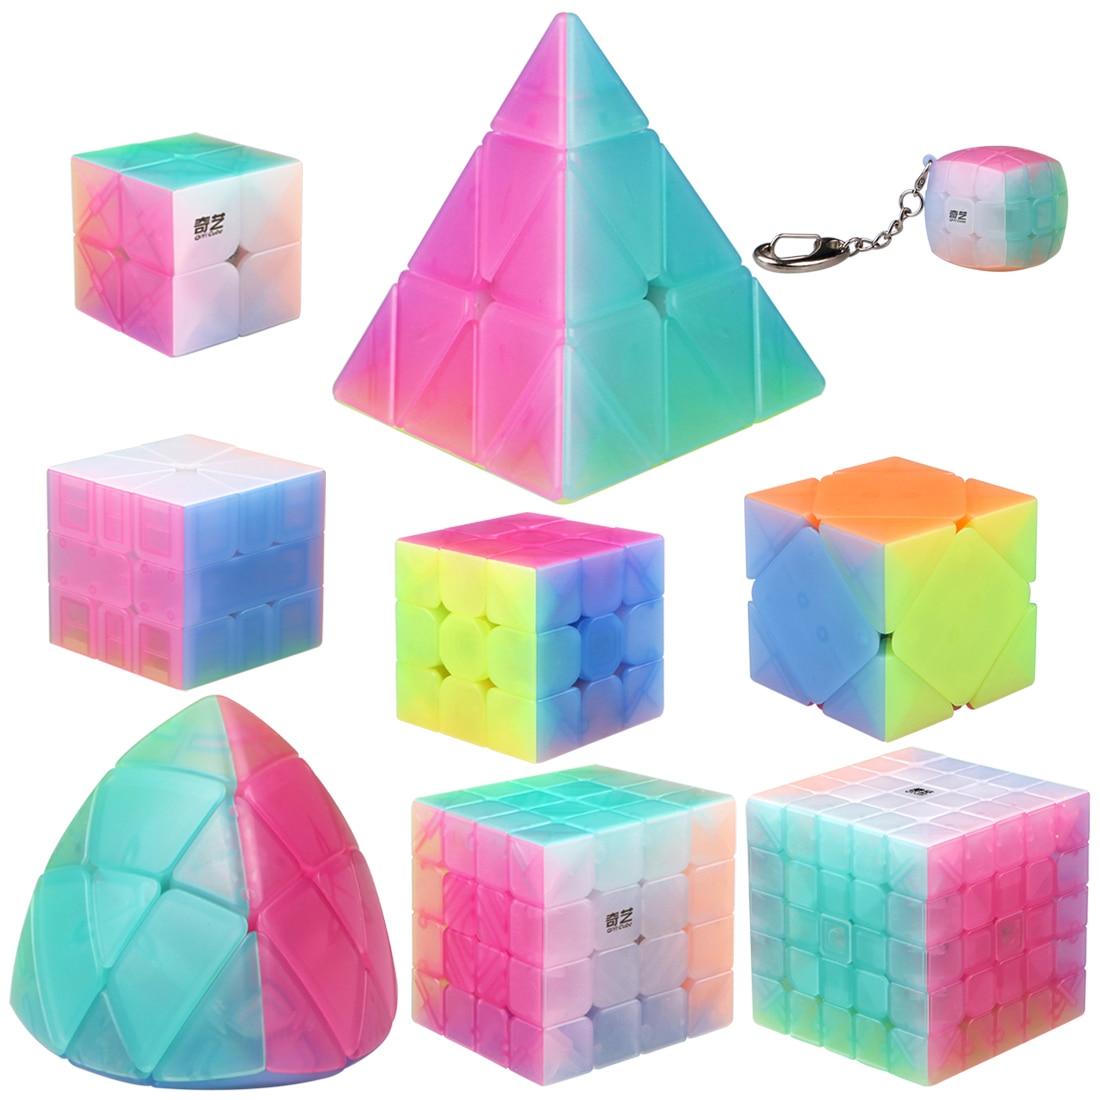 QiYi Jelly Cube Set Including Pyramid SQ-1 Mastermorphix 2x2 3x3 4x4 5x5 Magic Cube Kits